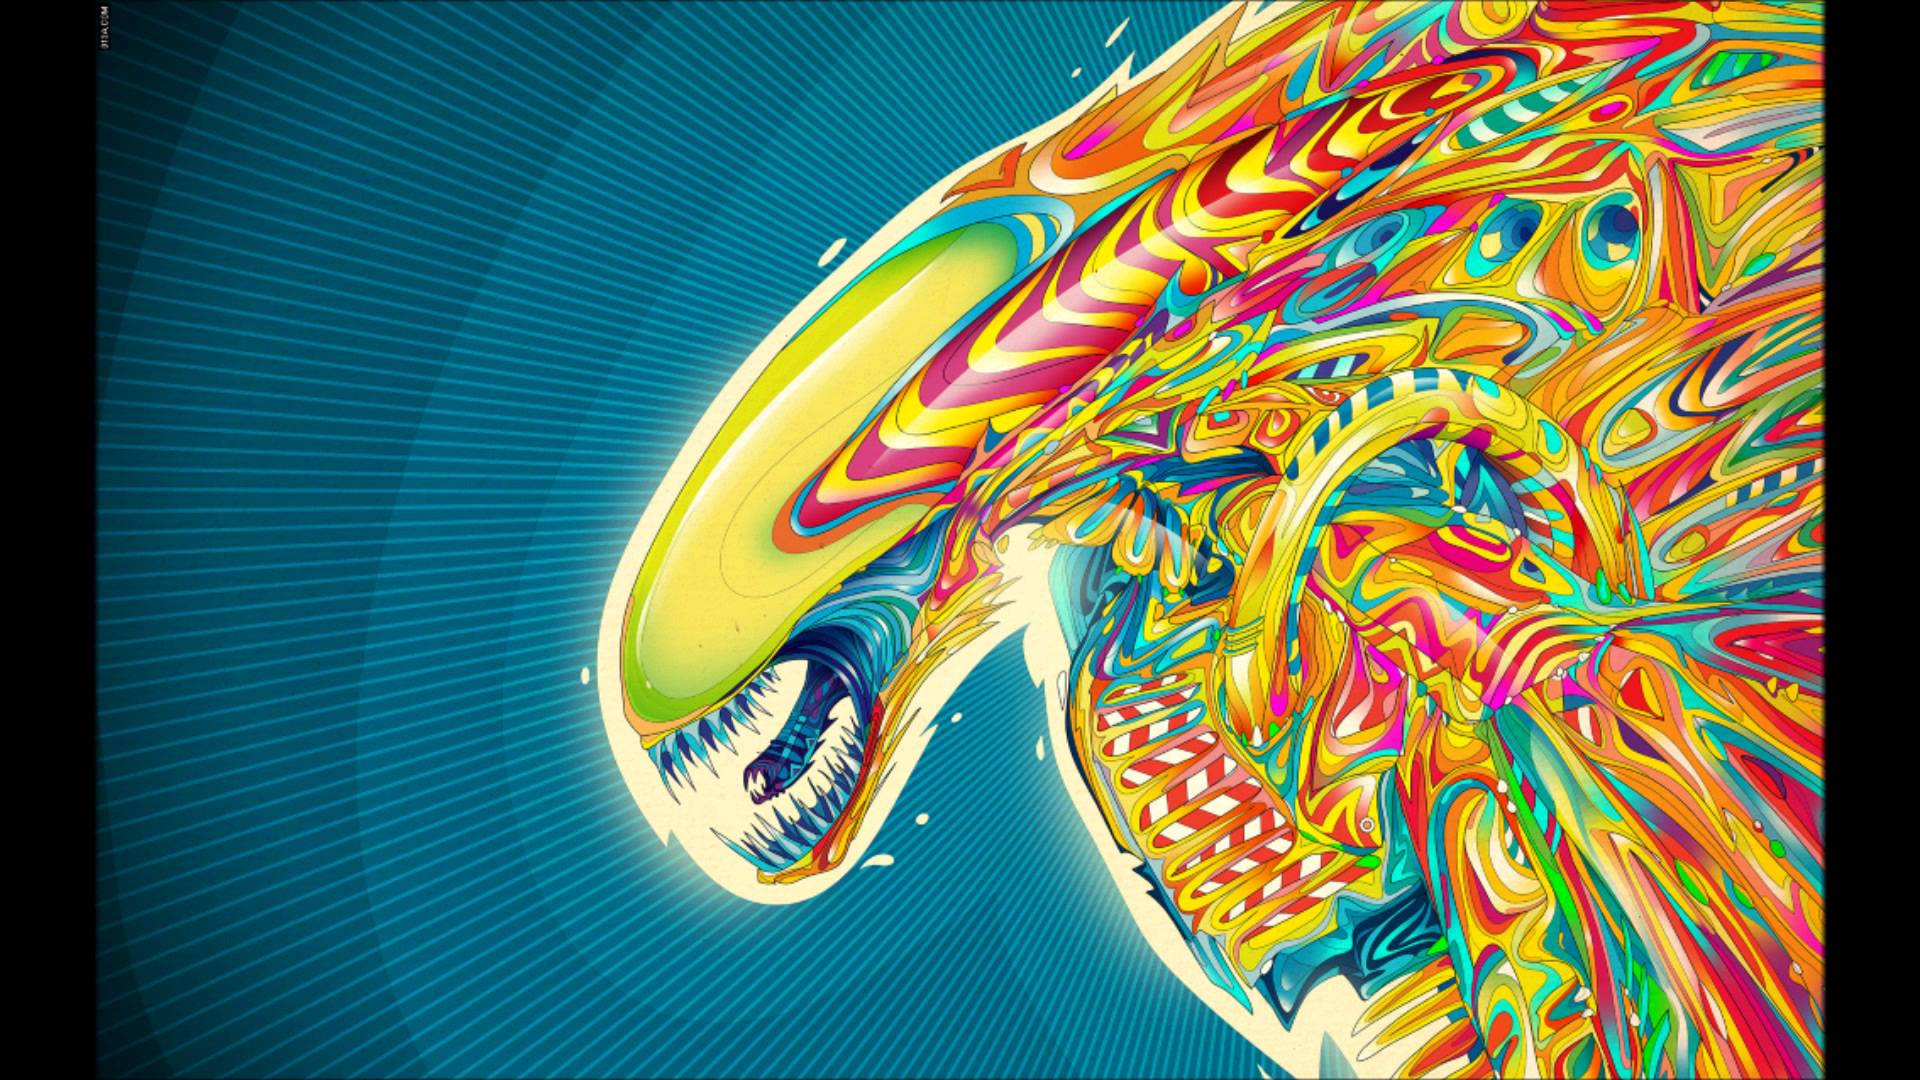 Psychedelic Wallpaper Robot